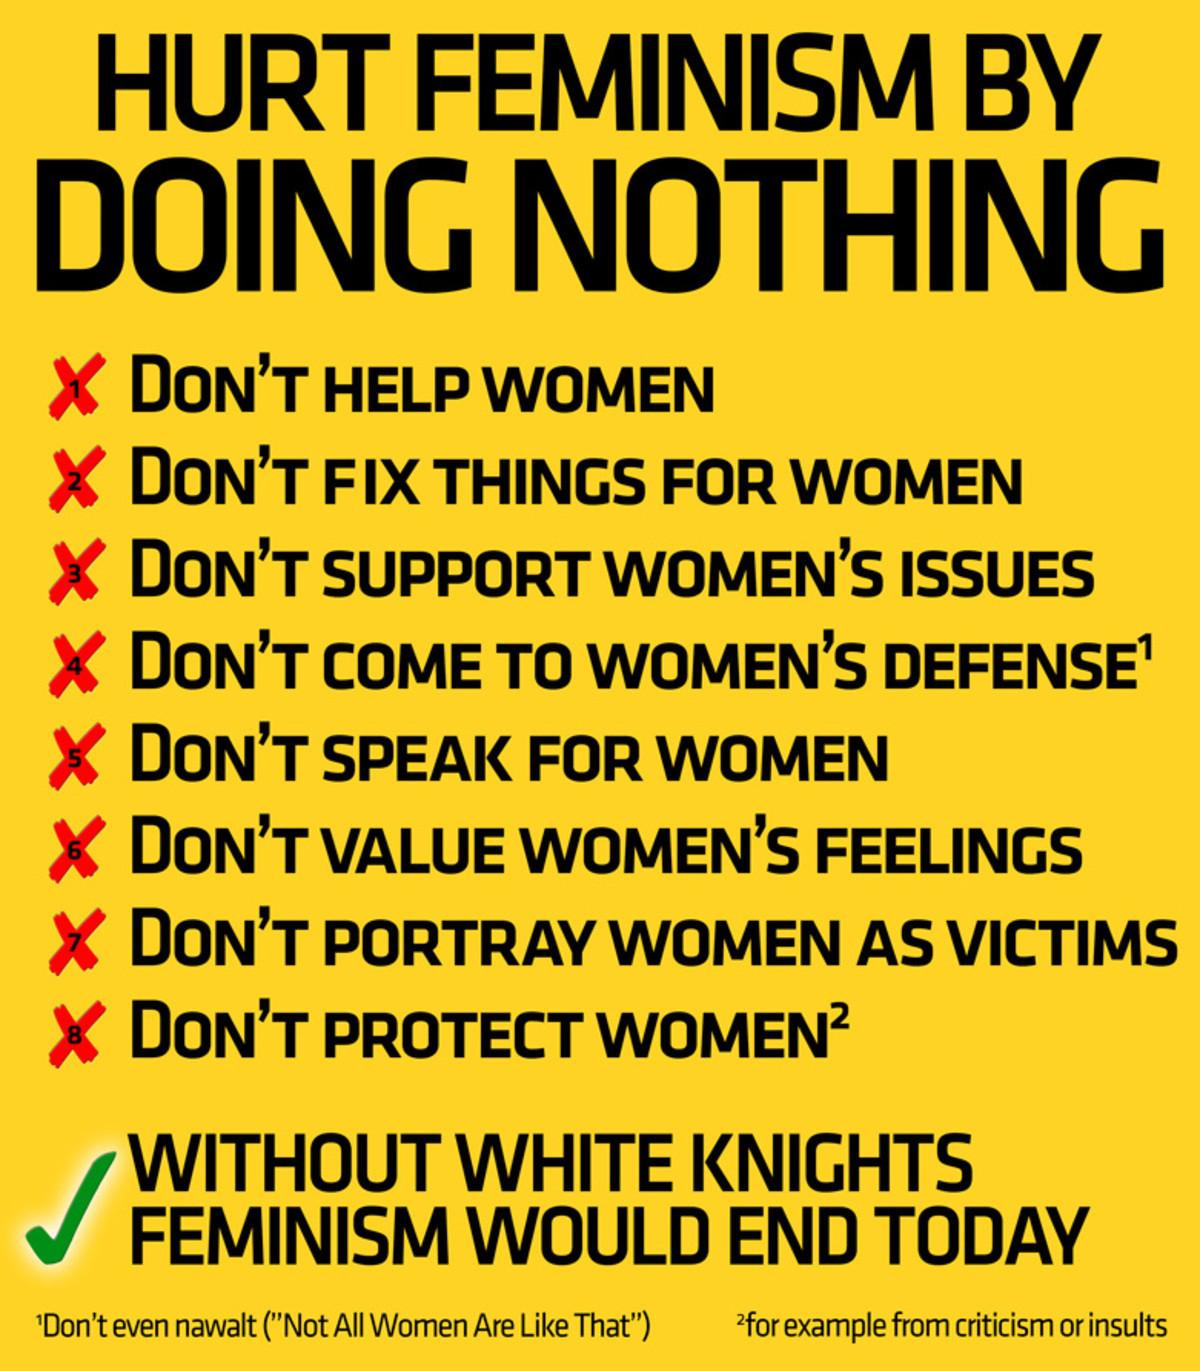 is this evil?. . HURT ! BY Miltie X DON' T HELP WOMEN X DON' T F Ix THINGS FOR W is this evil? HURT ! BY Miltie X DON' T HELP WOMEN F Ix THINGS FOR W